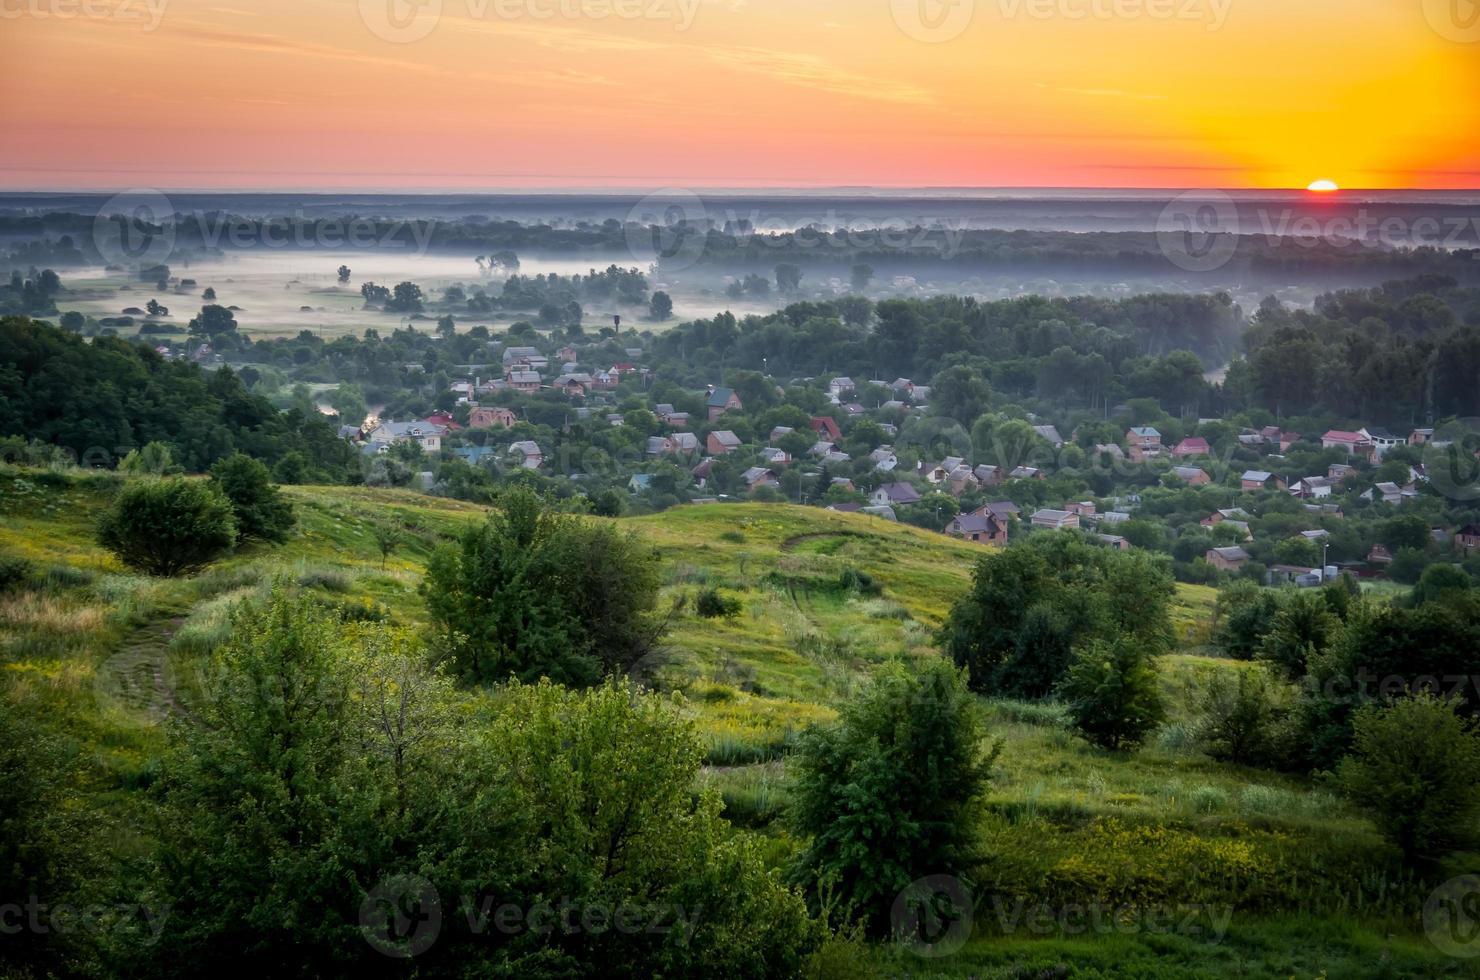 Sonnenaufgang im Sommer foto